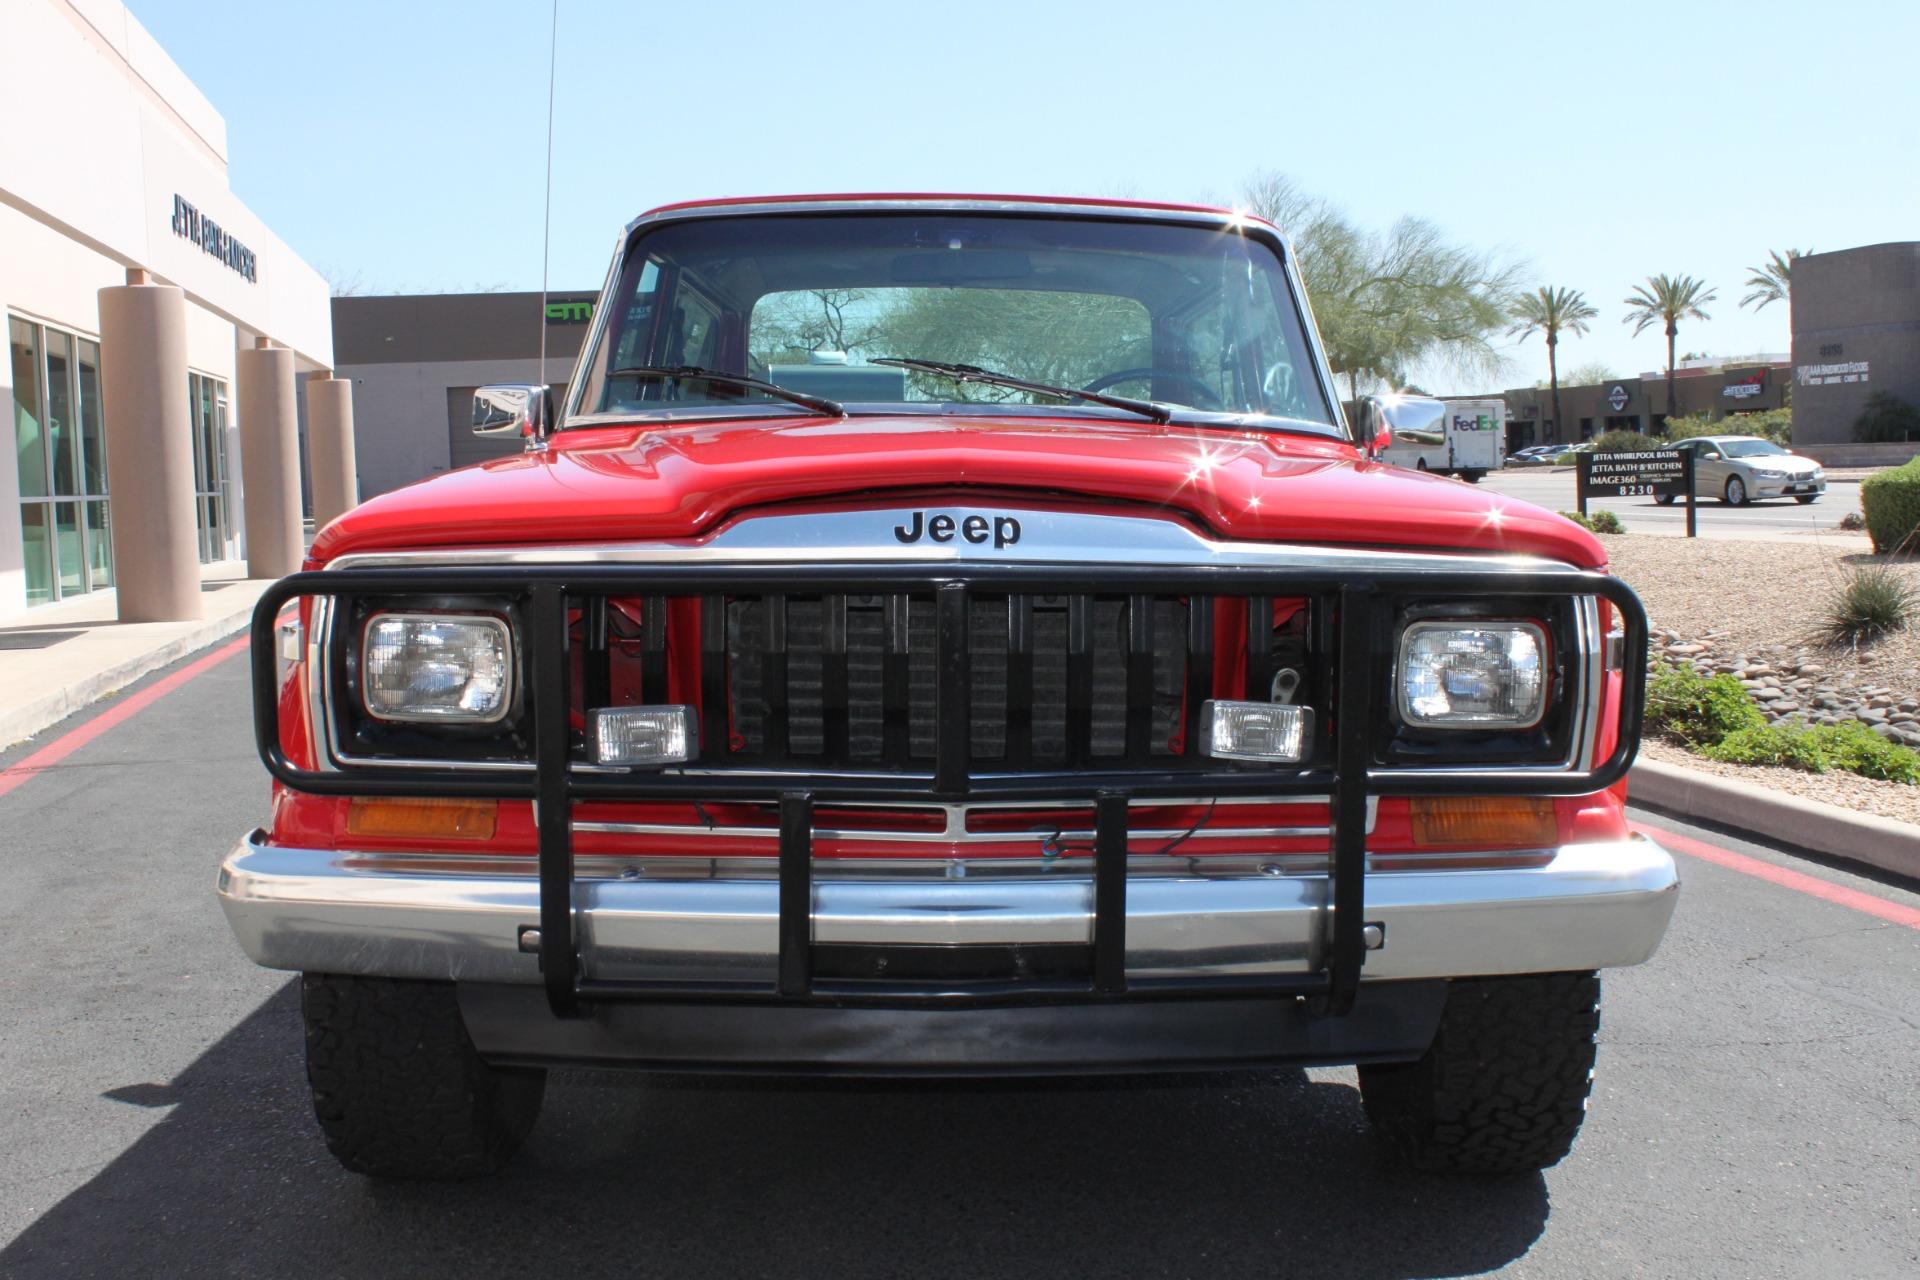 Used-1983-Jeep-Cherokee-4WD-Chief-Wrangler